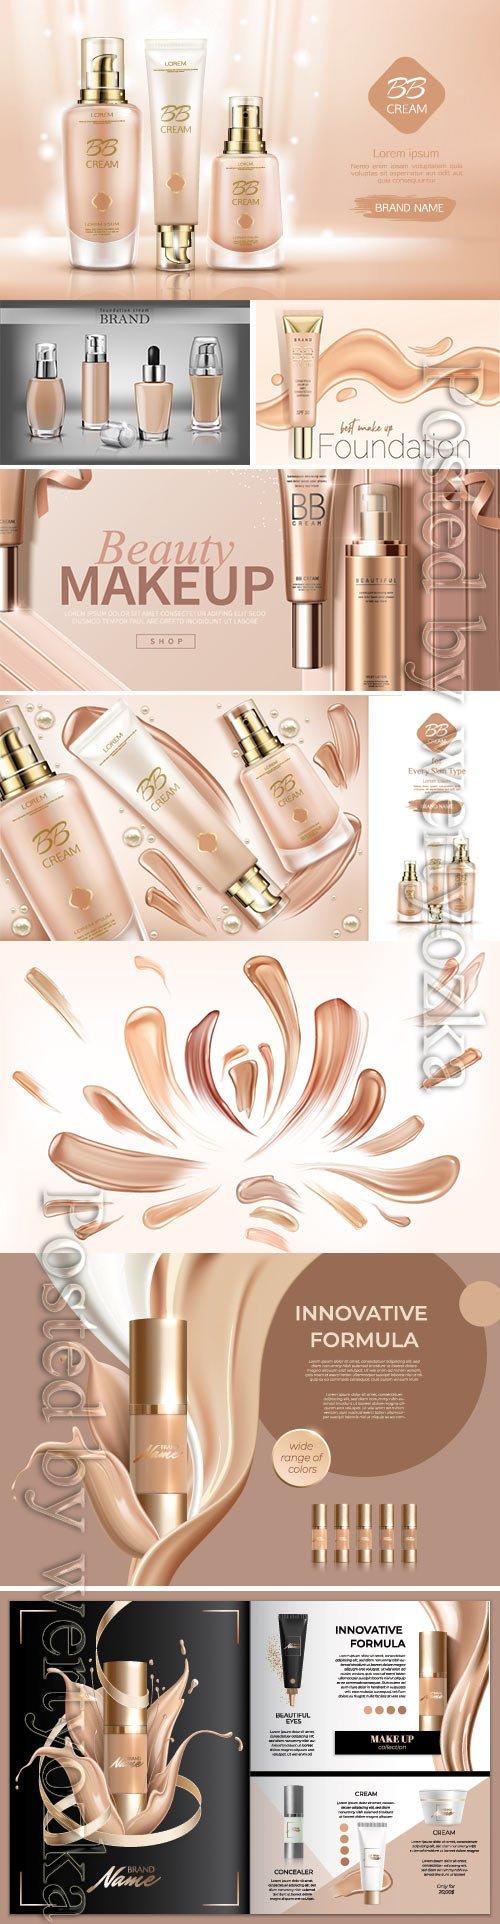 Bb cream beauty cosmetics and smears foundation vector illustration